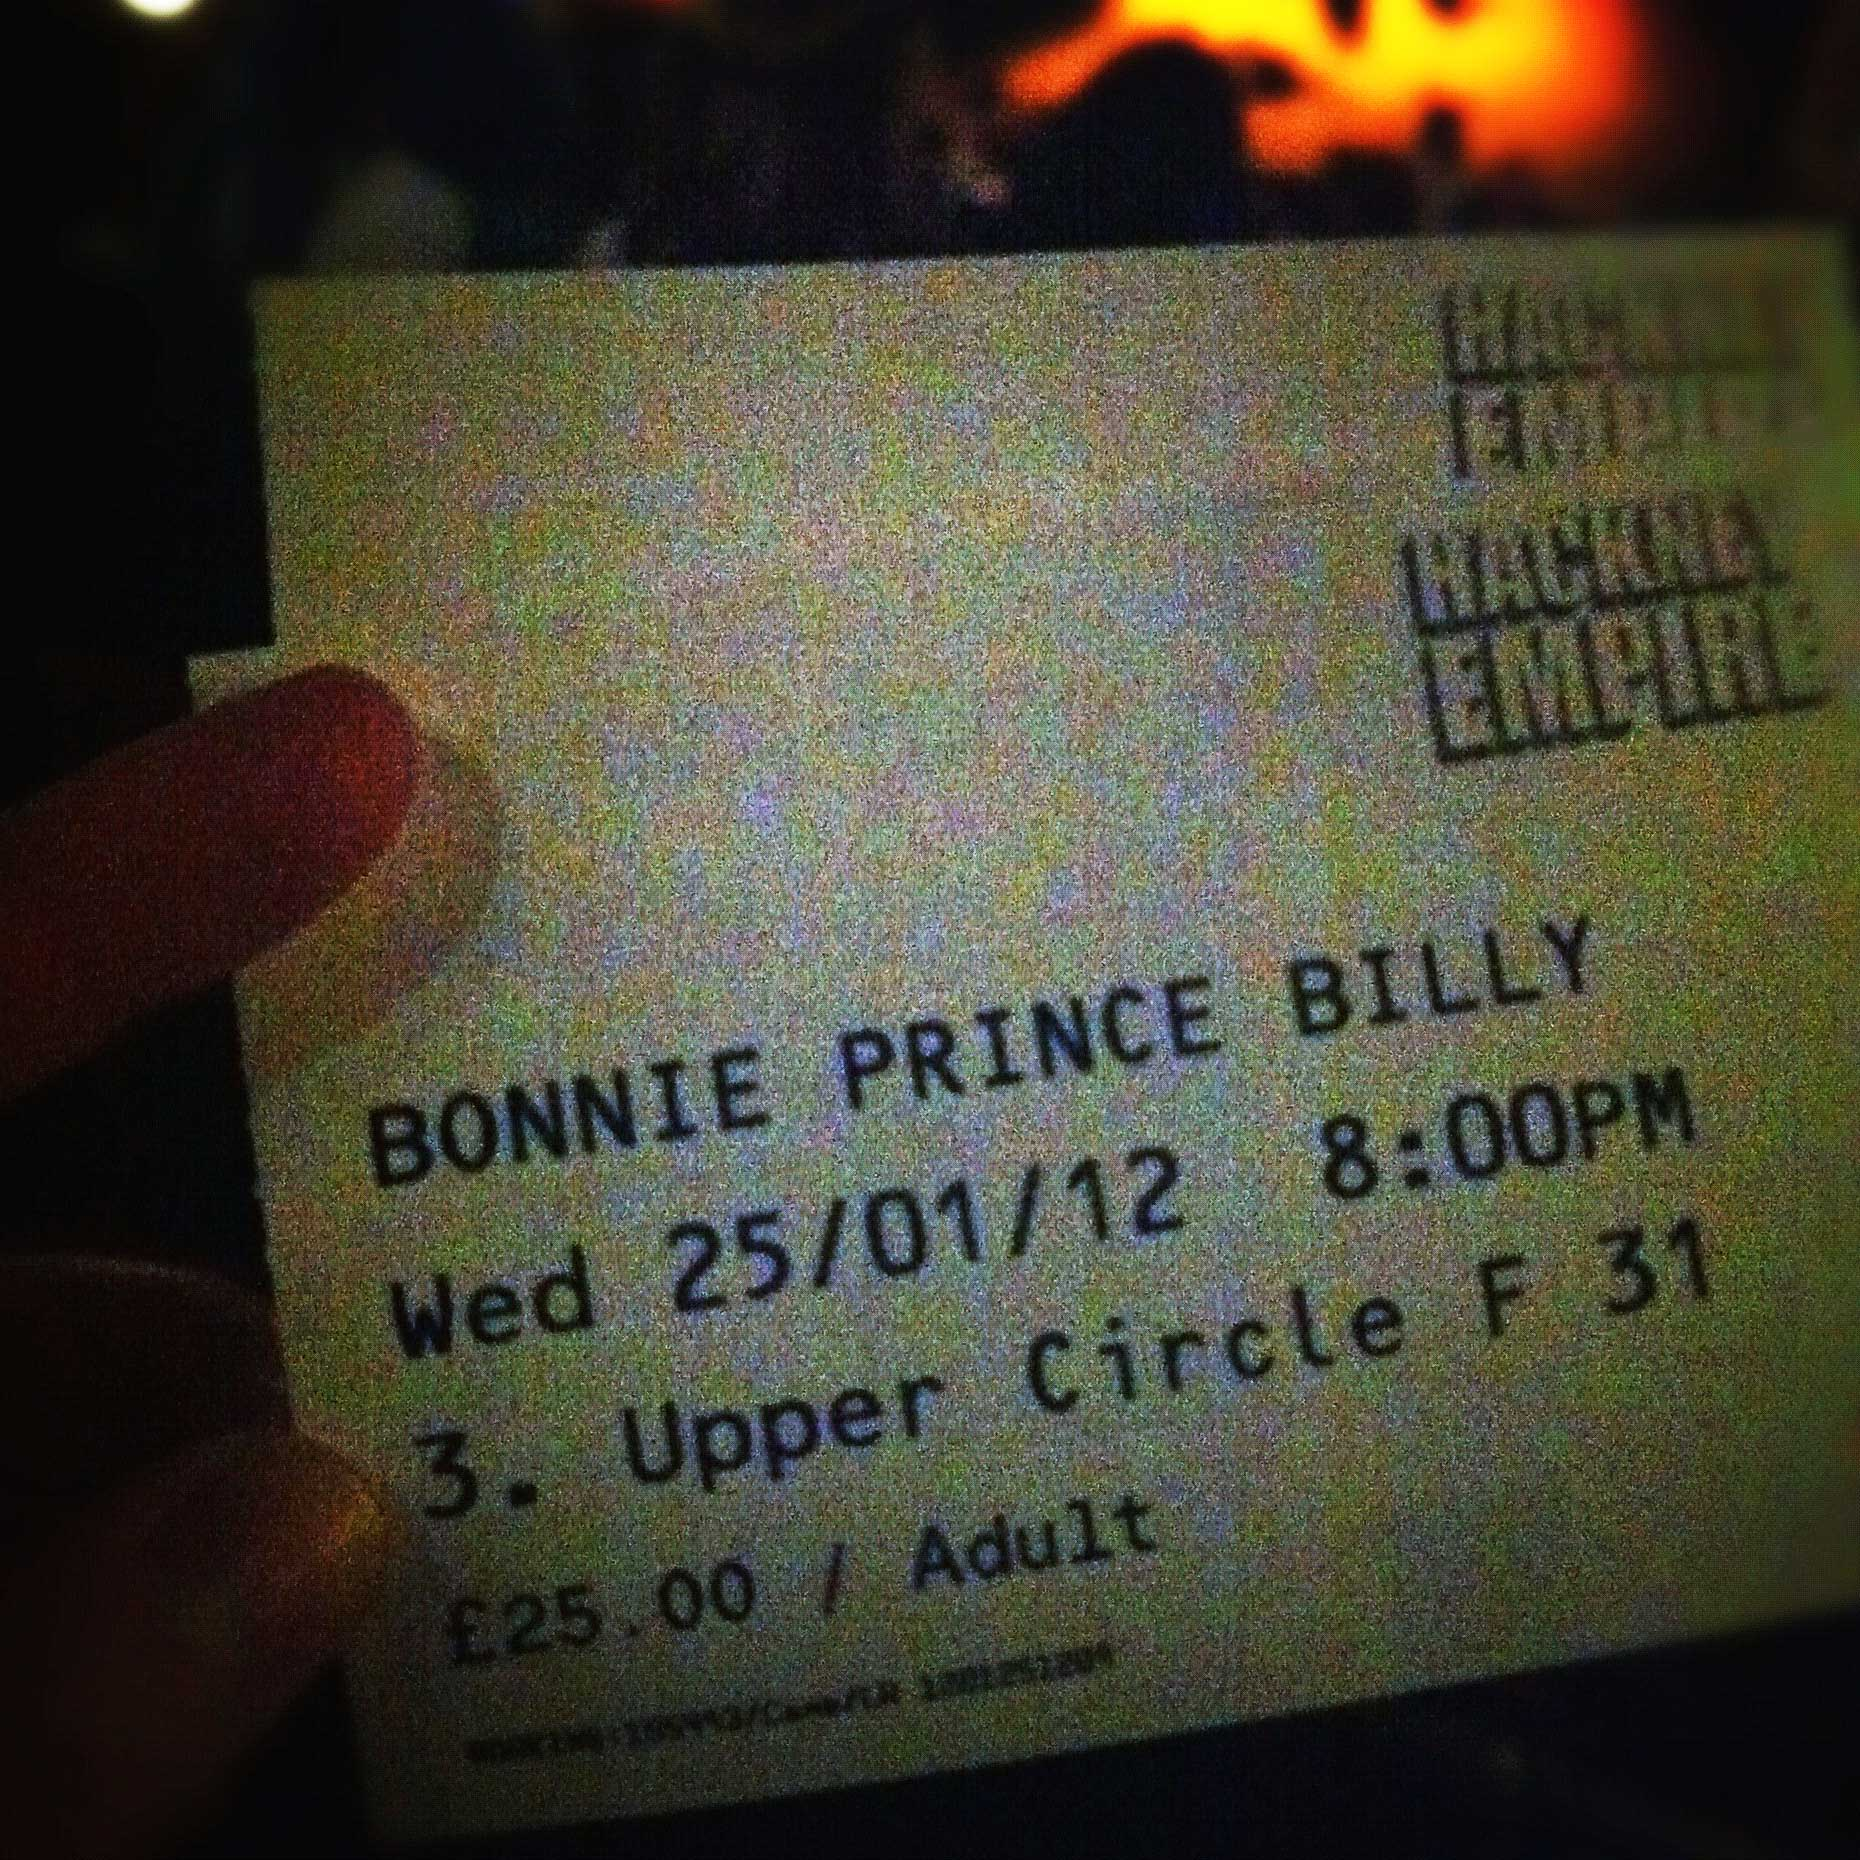 bonnie-prince-billy-tix1.jpg